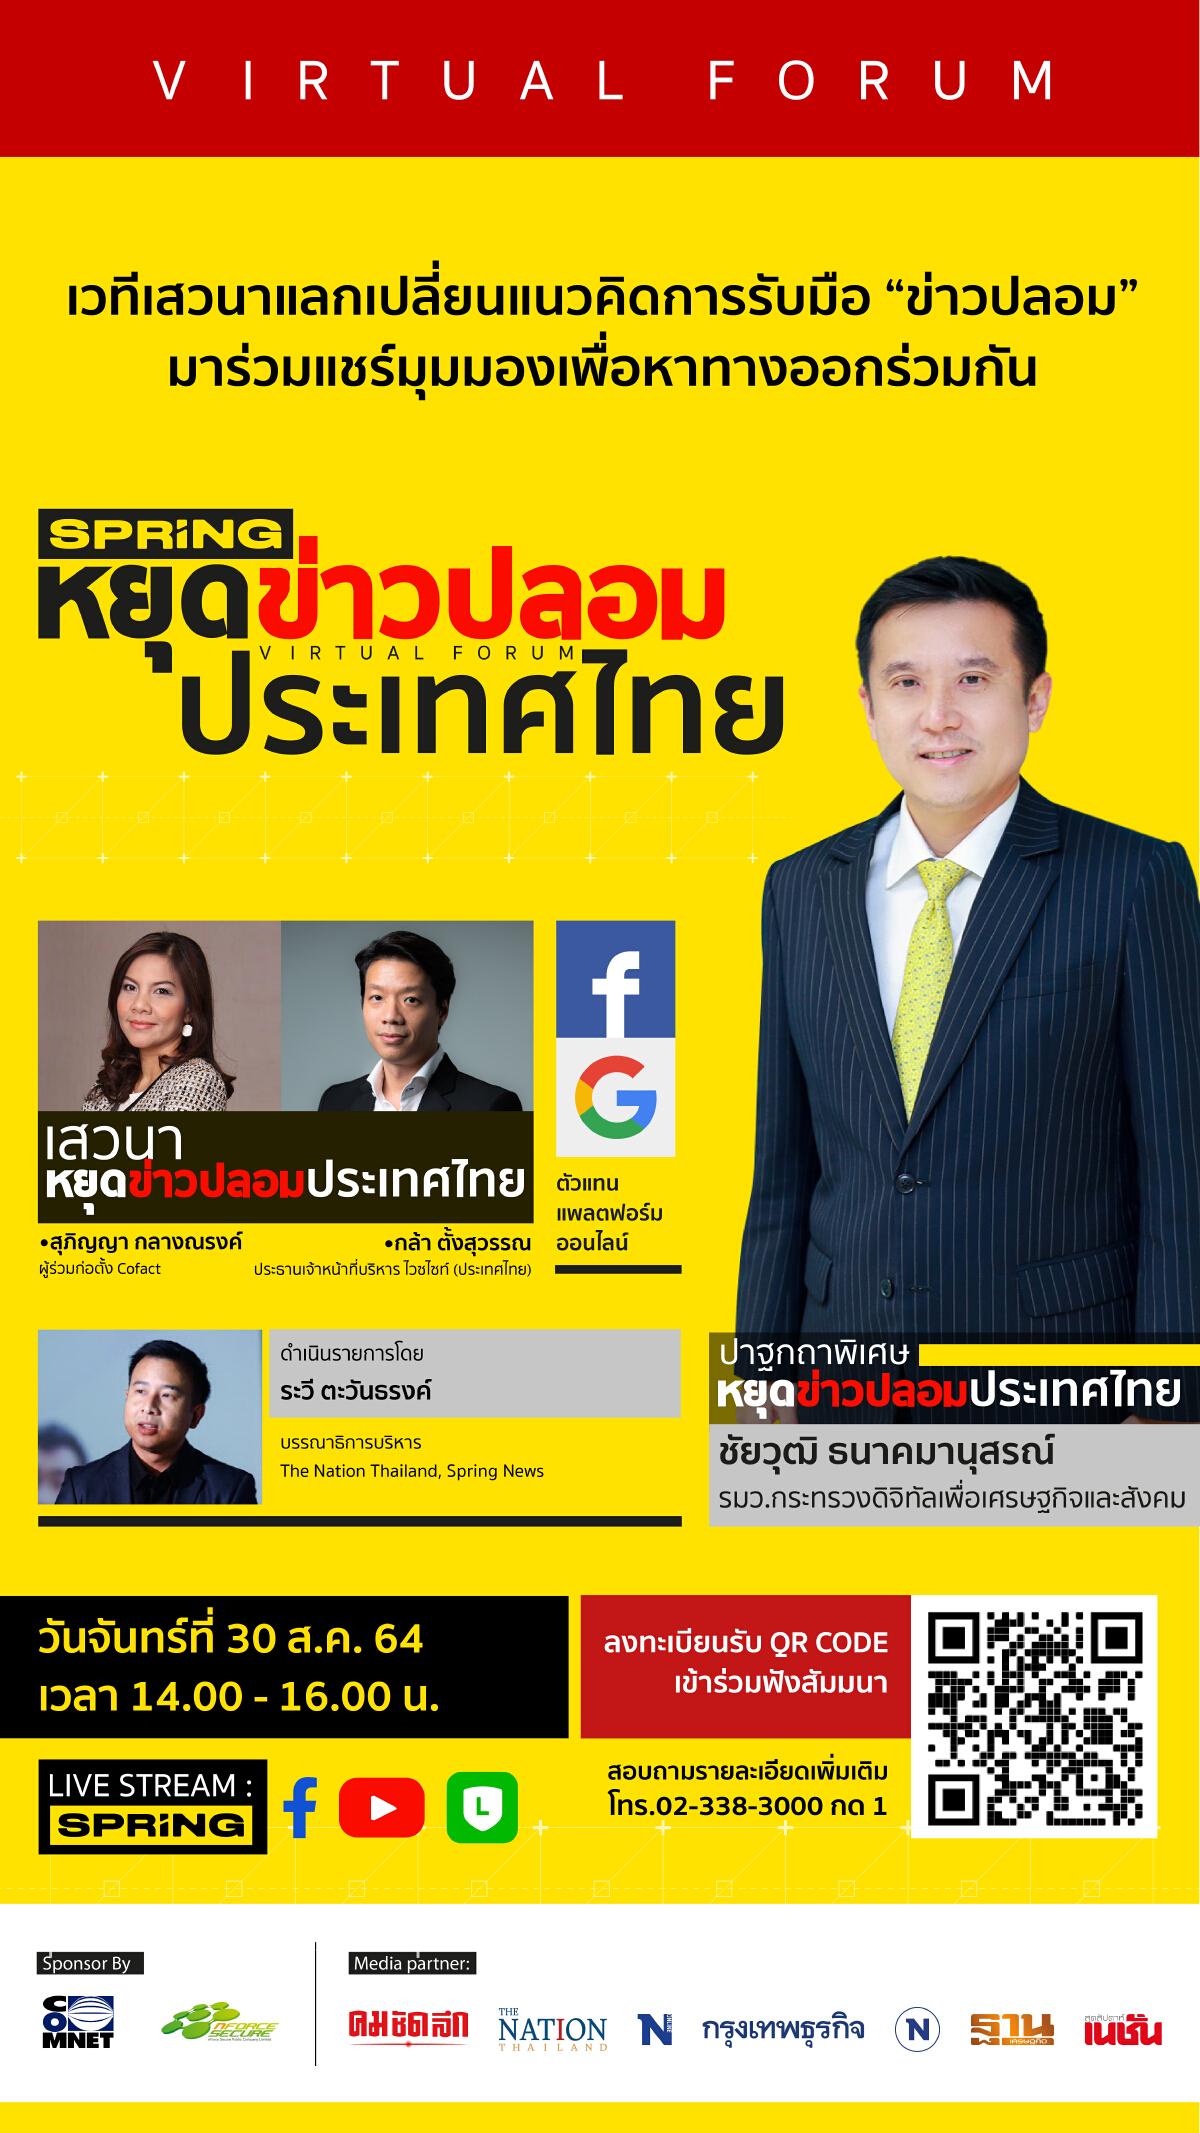 virtual หยุดข่าวปลอม ประเทศไทย